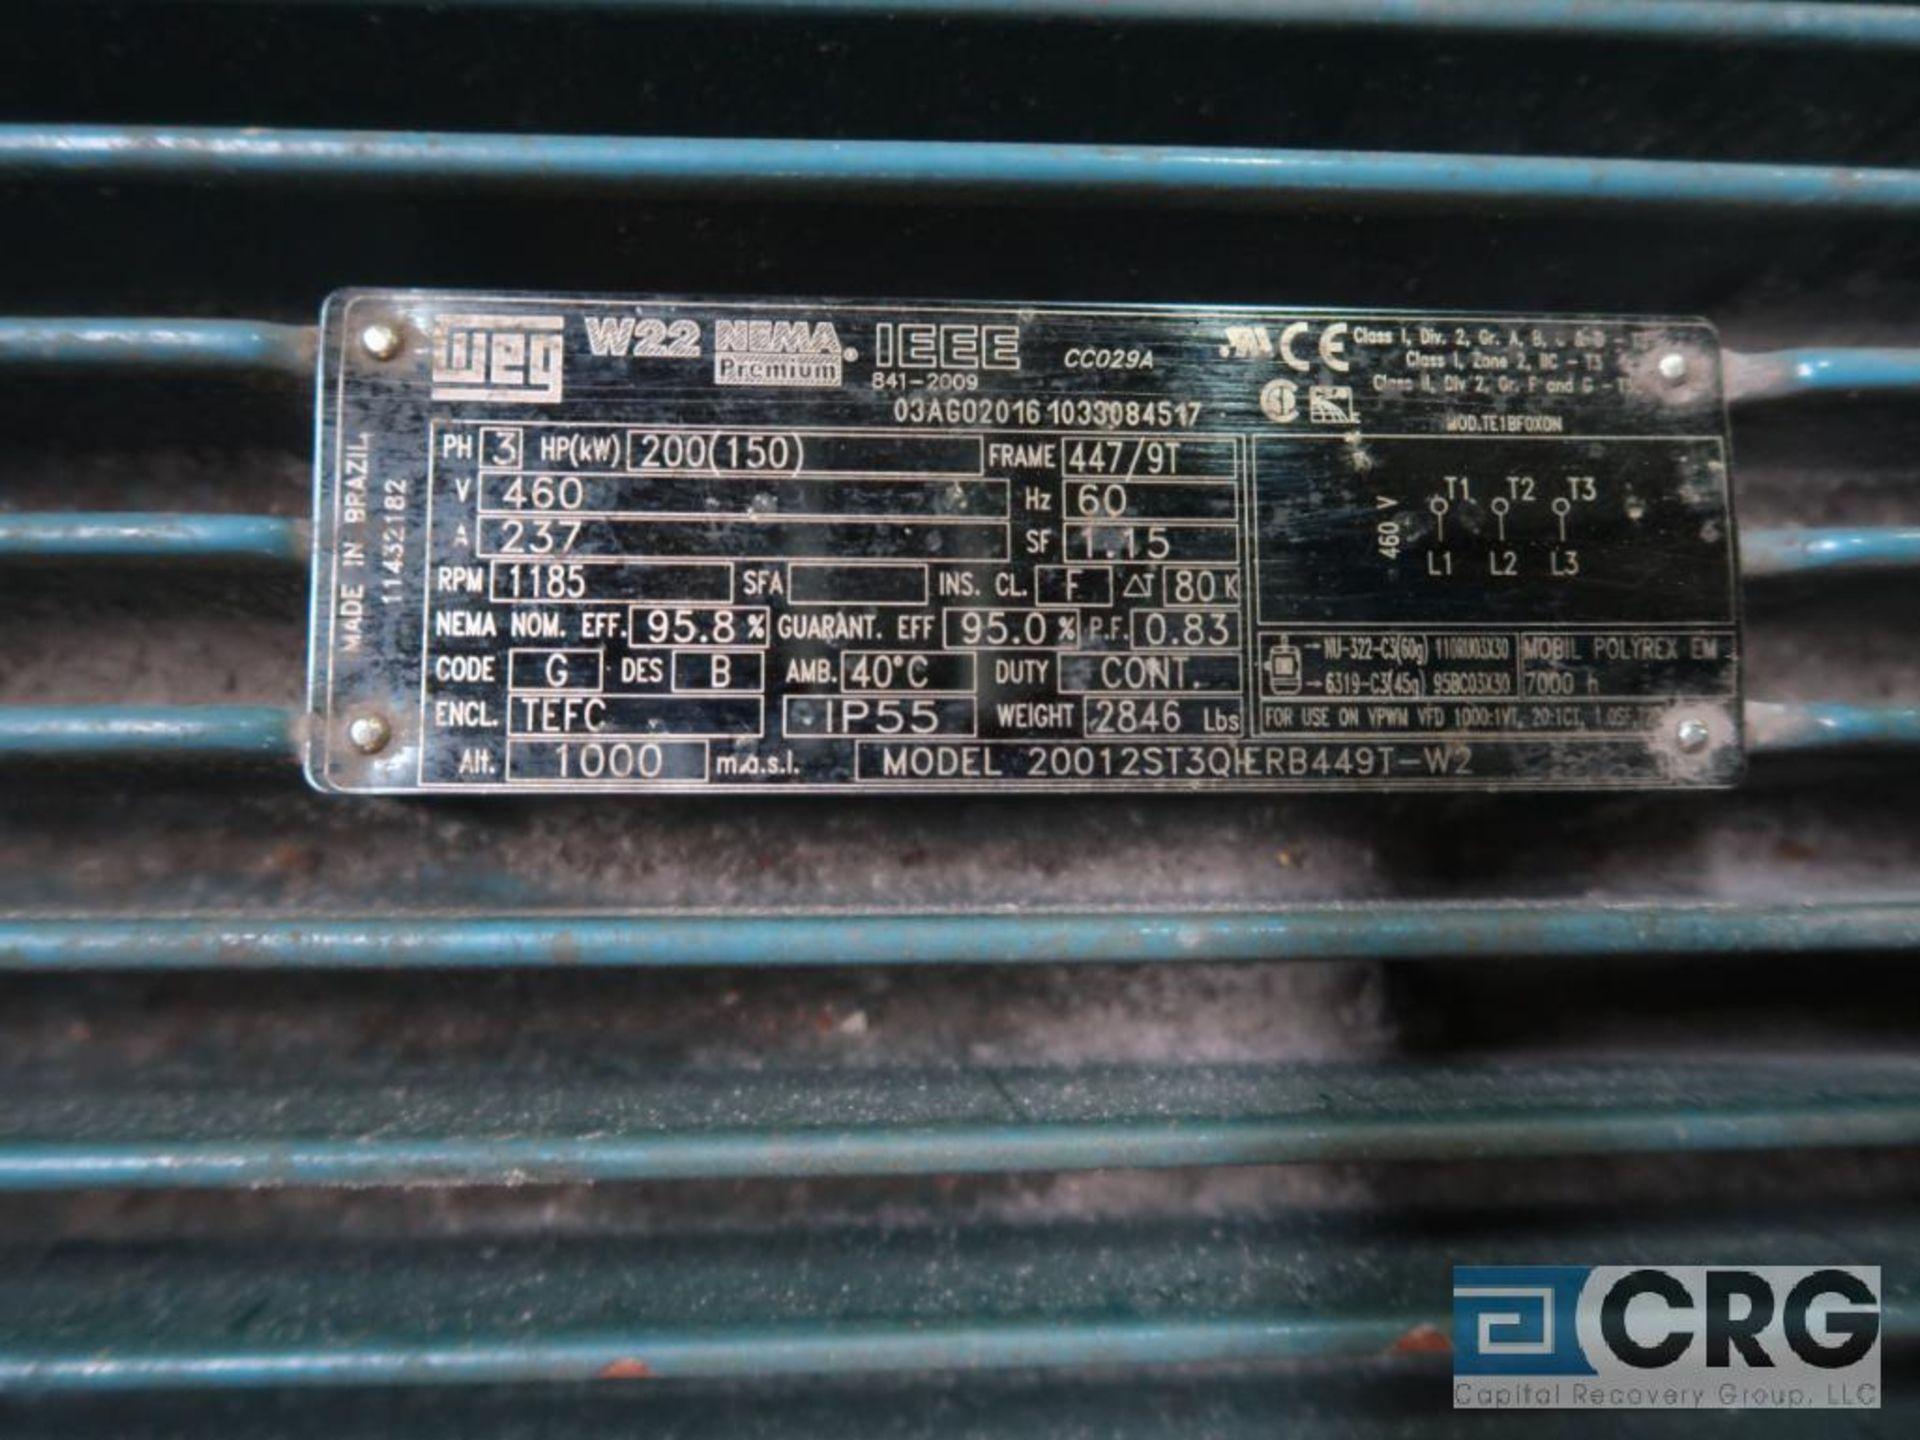 WEG electric motor, 200 HP, 1,185 RPMs, 460 volt, 3 ph., 447/9T frame (Finish Building) - Image 2 of 2